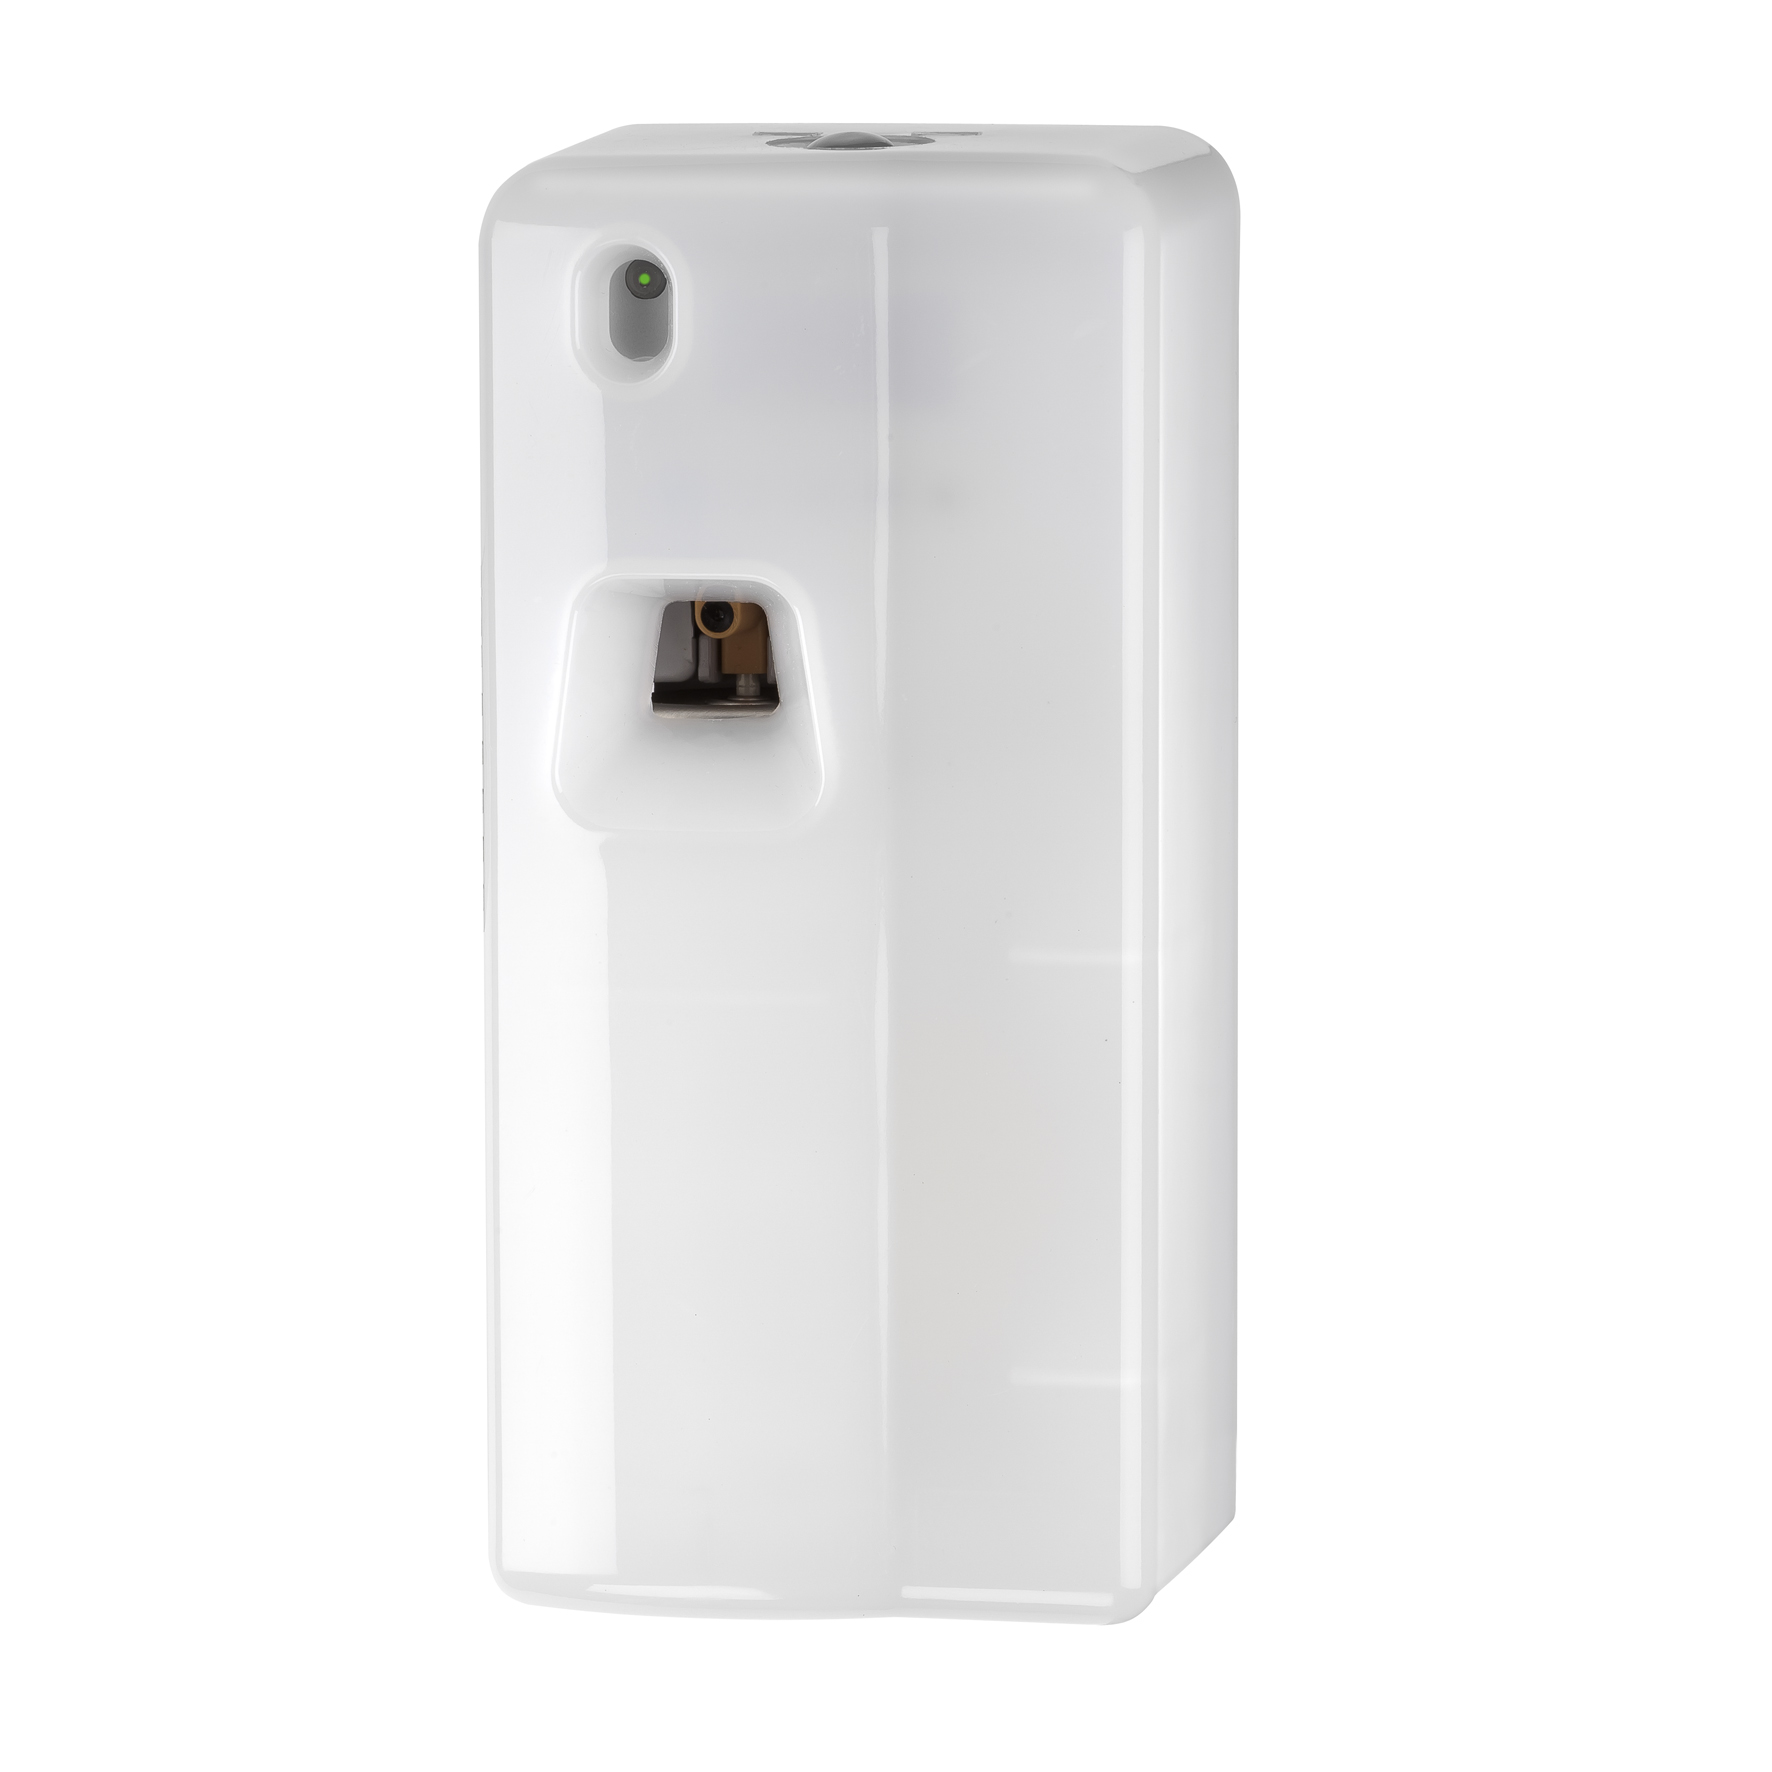 CLEANLINE digitale dispenser luchtverfr.